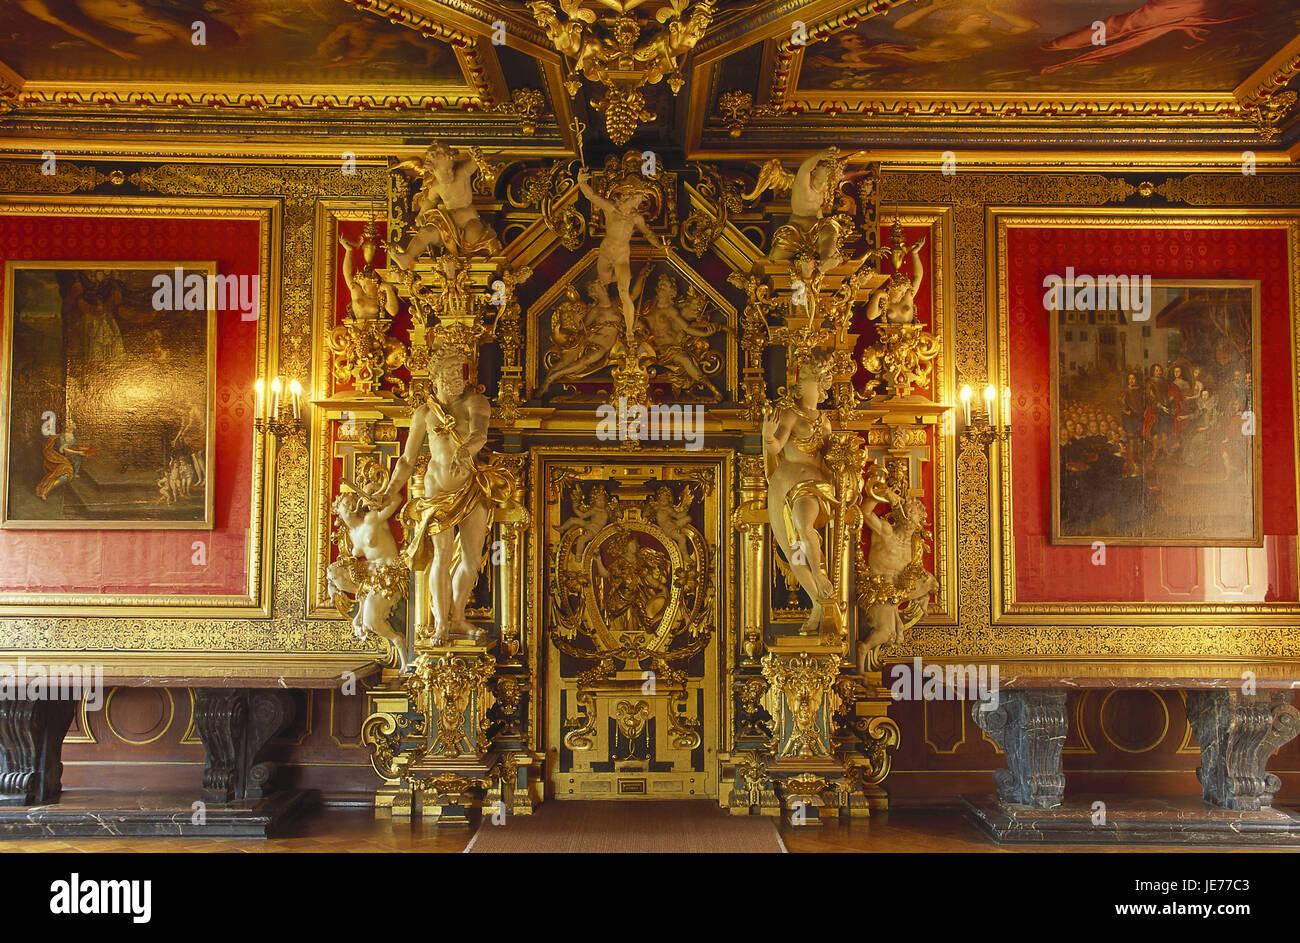 Germany, Lower Saxony, Bueckeburg, residence lock, golden hall, god's gate, Weser mountainous country, lock - Stock Image